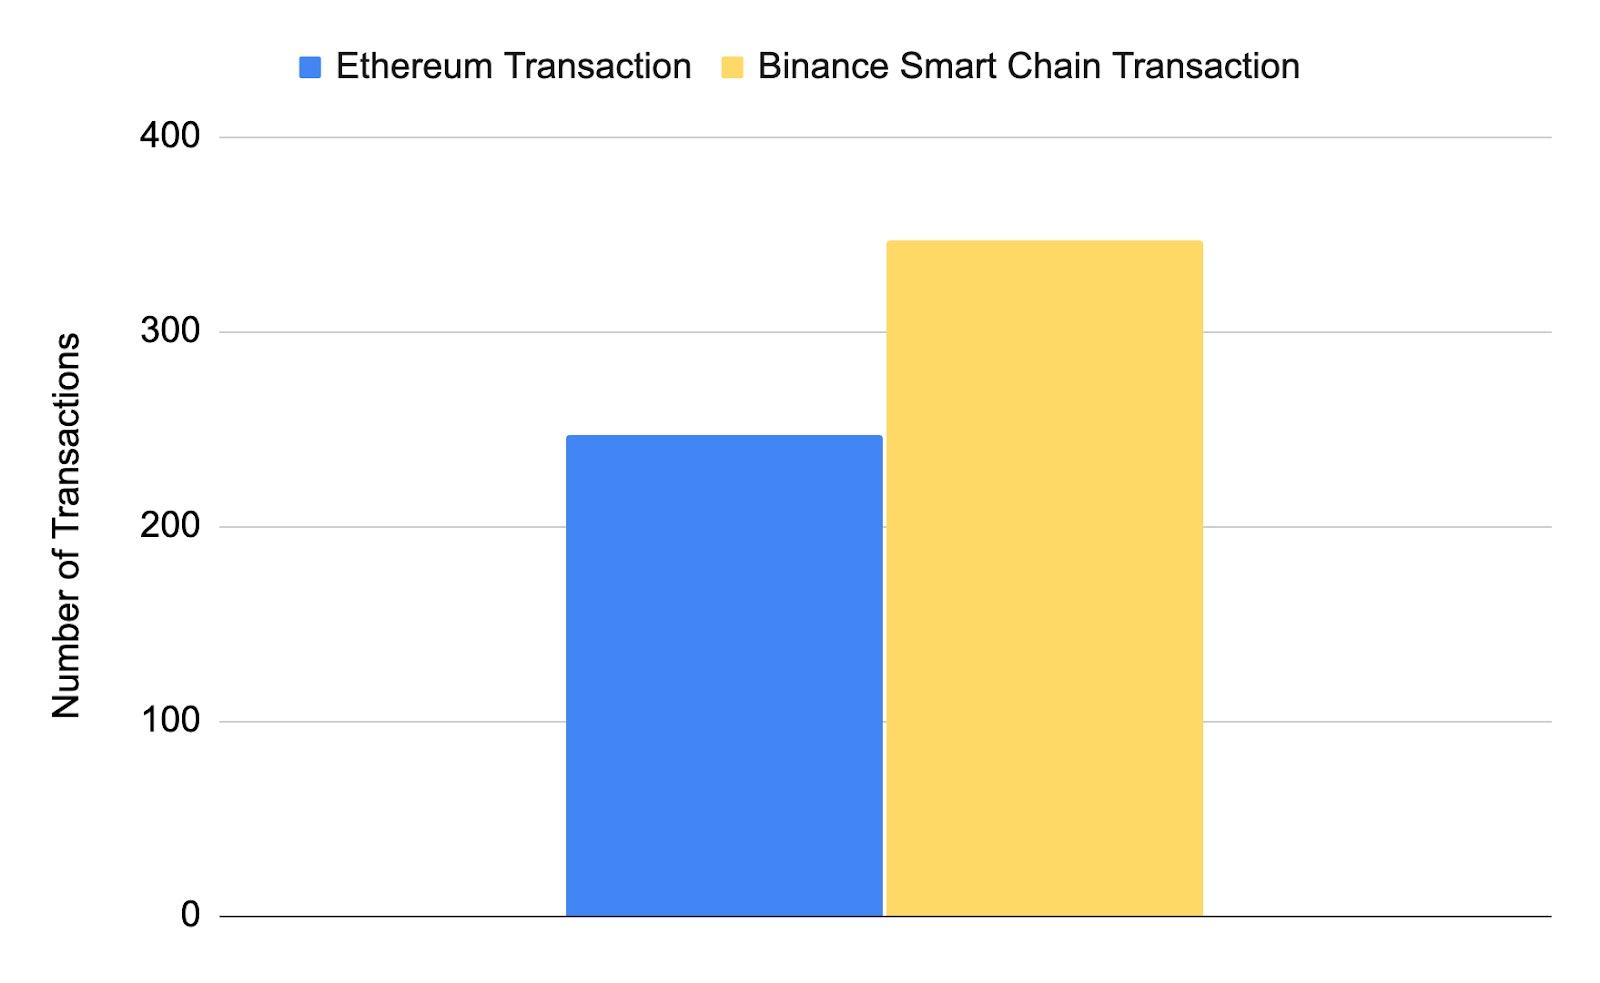 Total strategy optimiser transactions